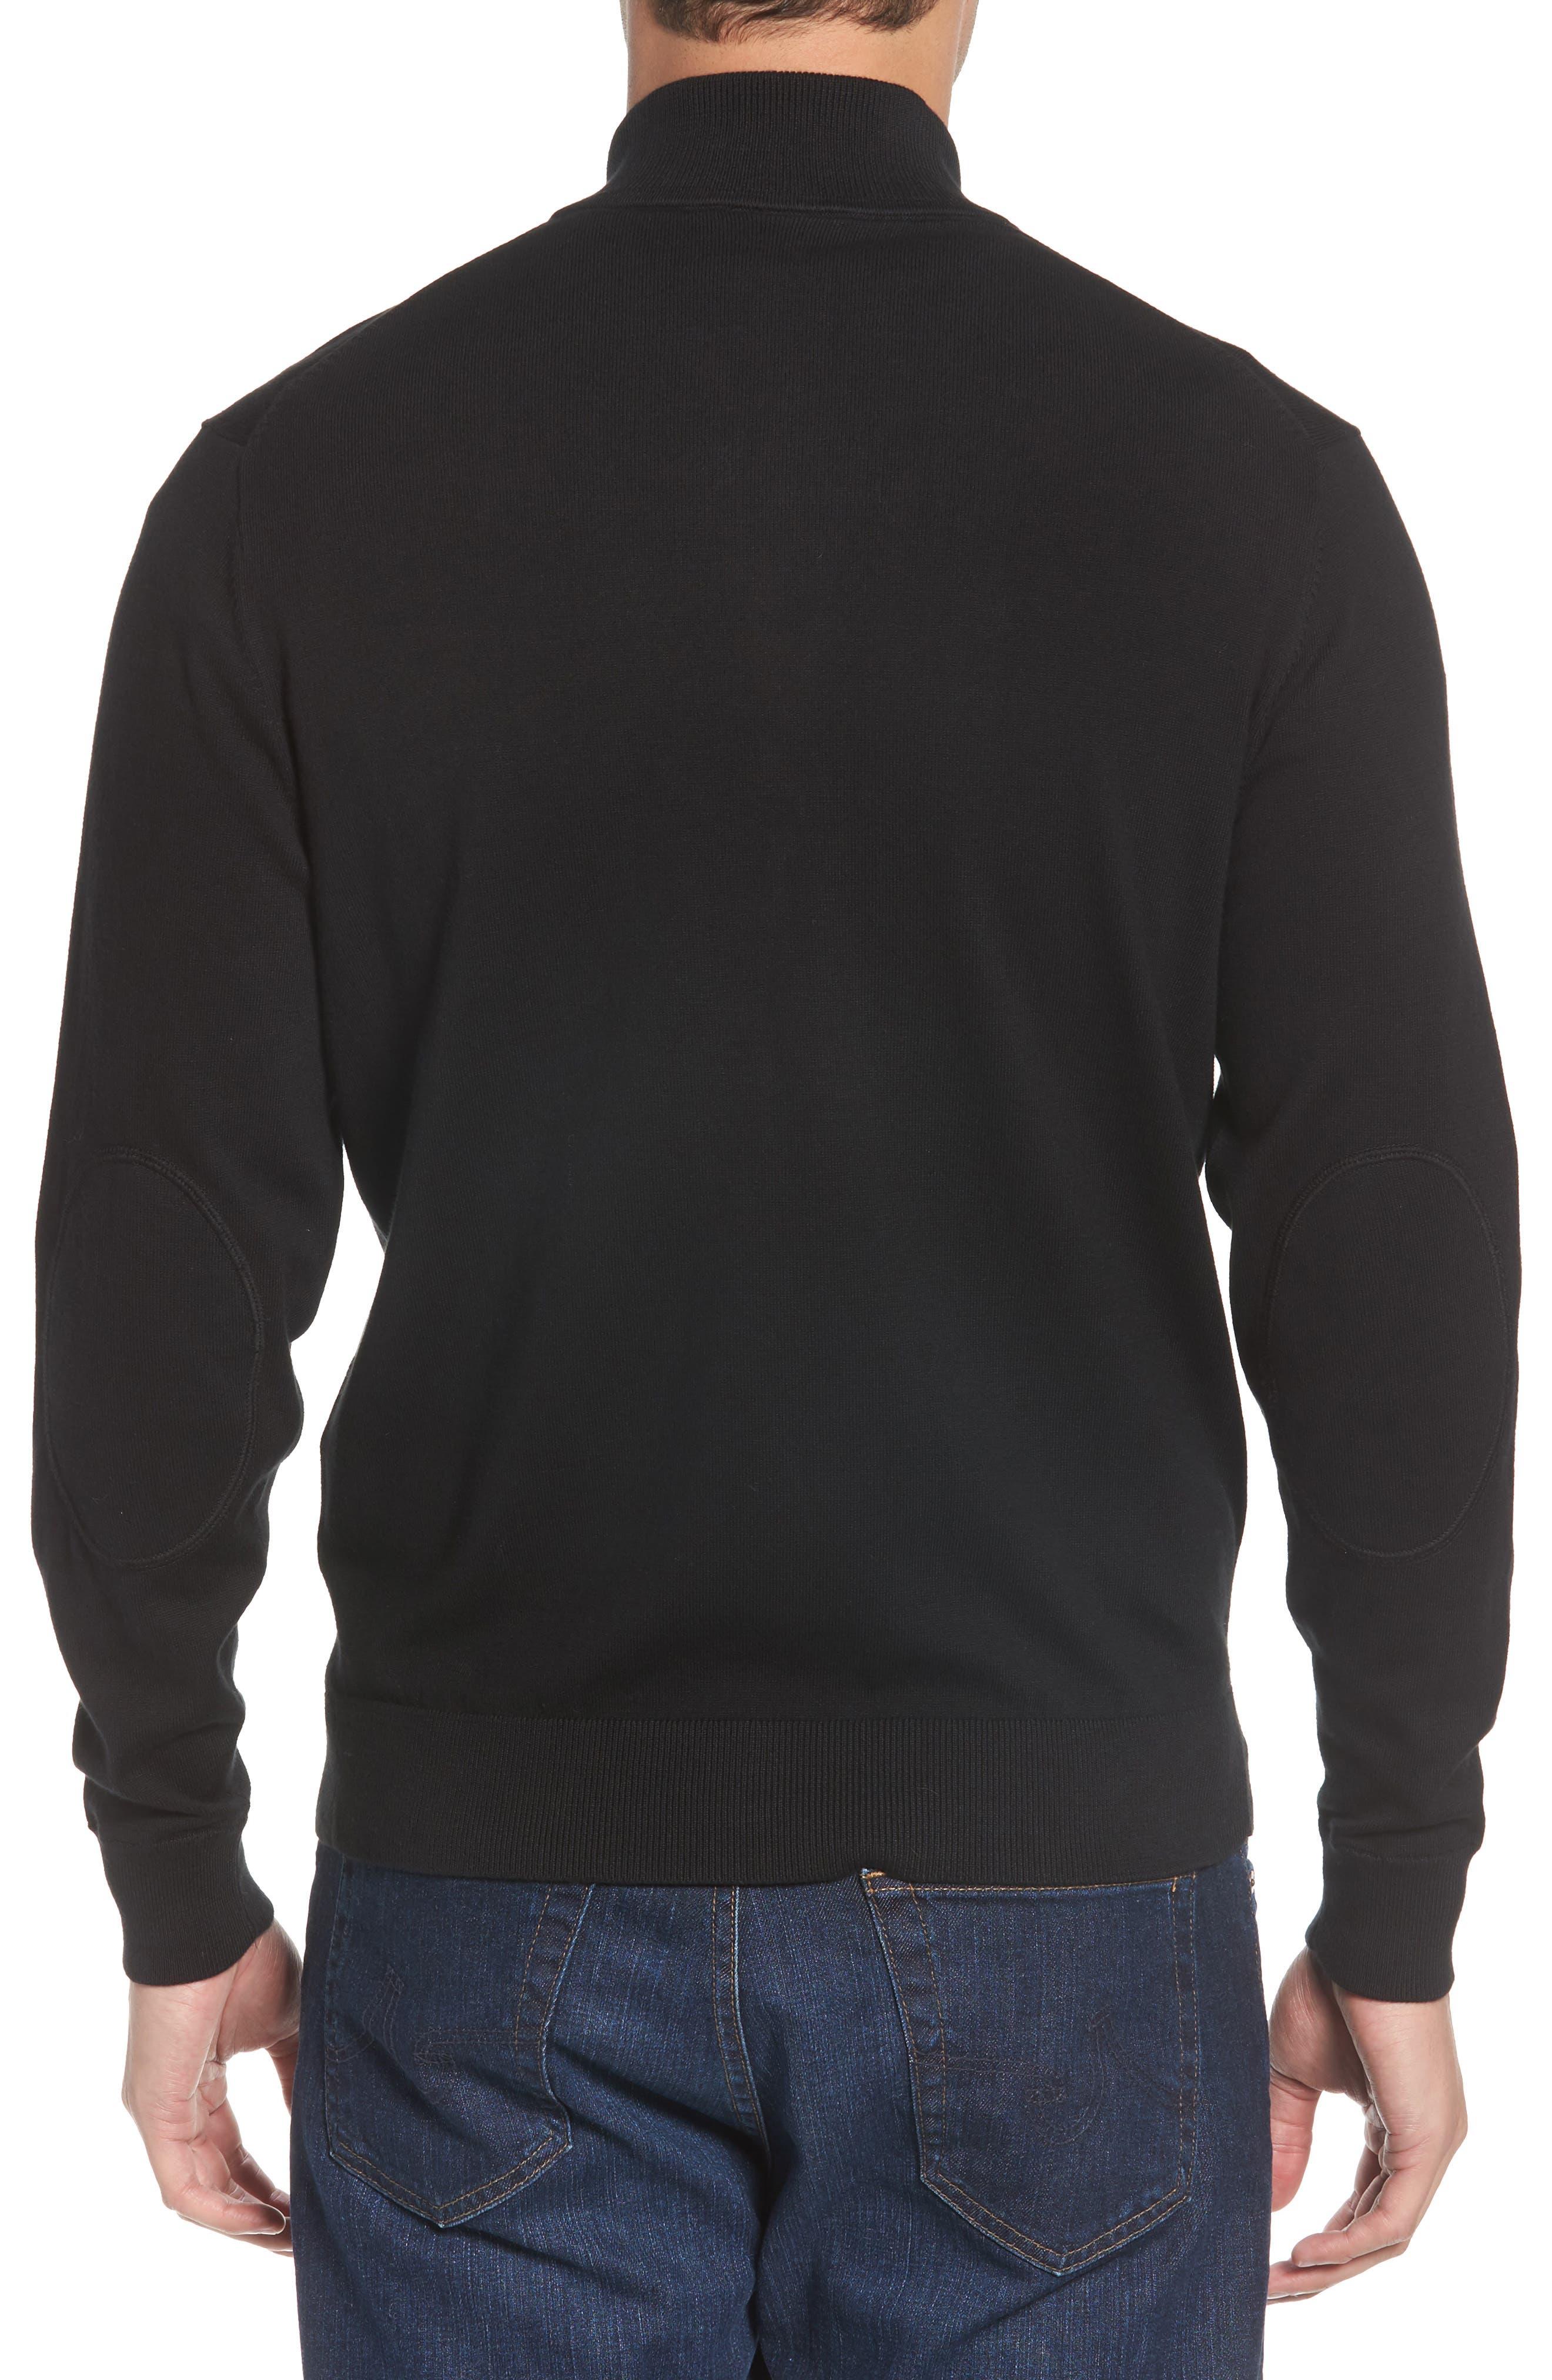 Atlanta Falcons - Lakemont Regular Fit Quarter Zip Sweater,                             Alternate thumbnail 2, color,                             BLACK